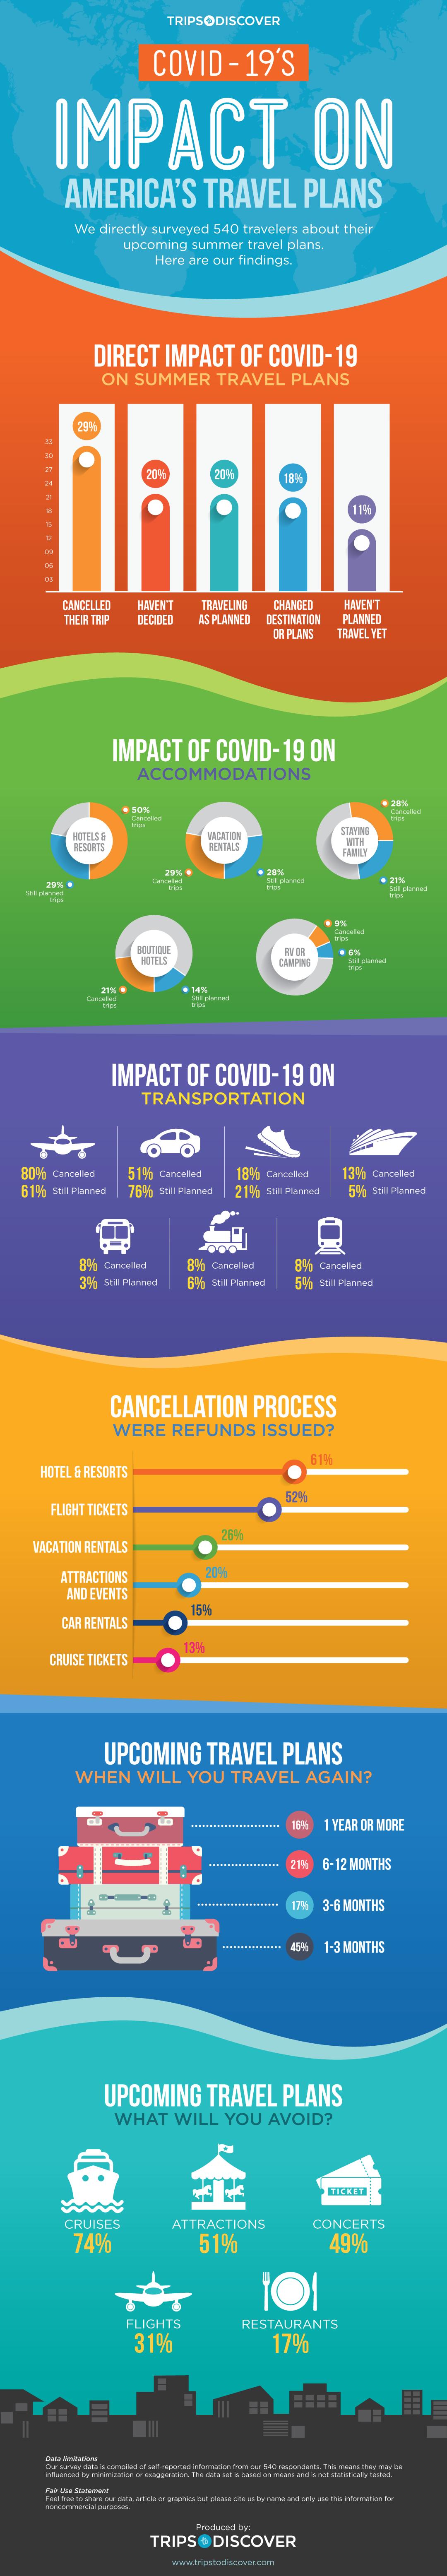 Infographic Covid19 Travel Impact